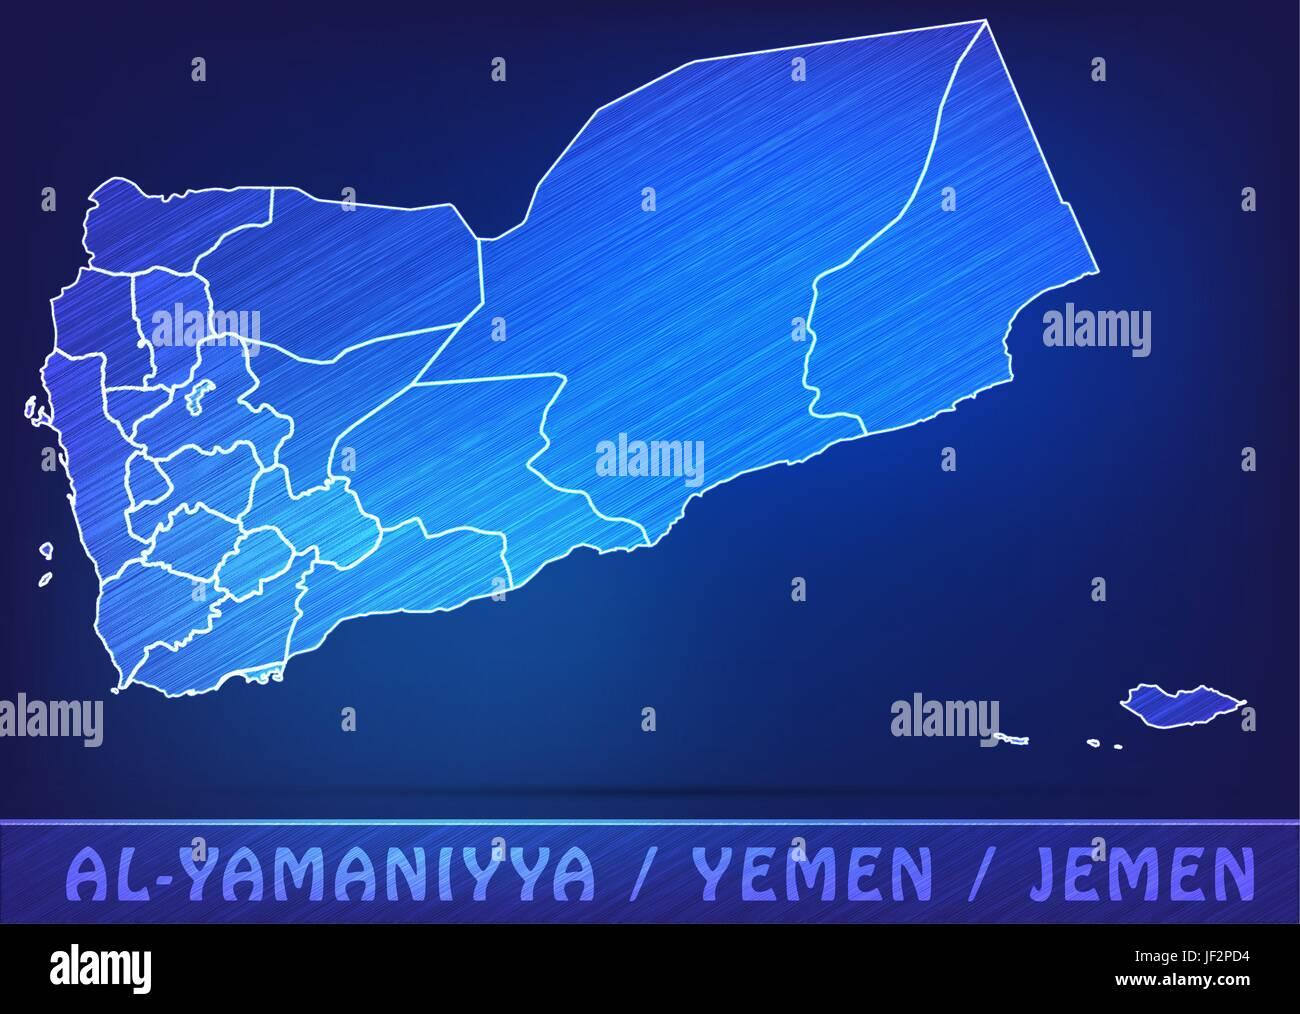 card, yemen, land, realty, ground, atlas, map of the world, map, model, design, - Stock Vector